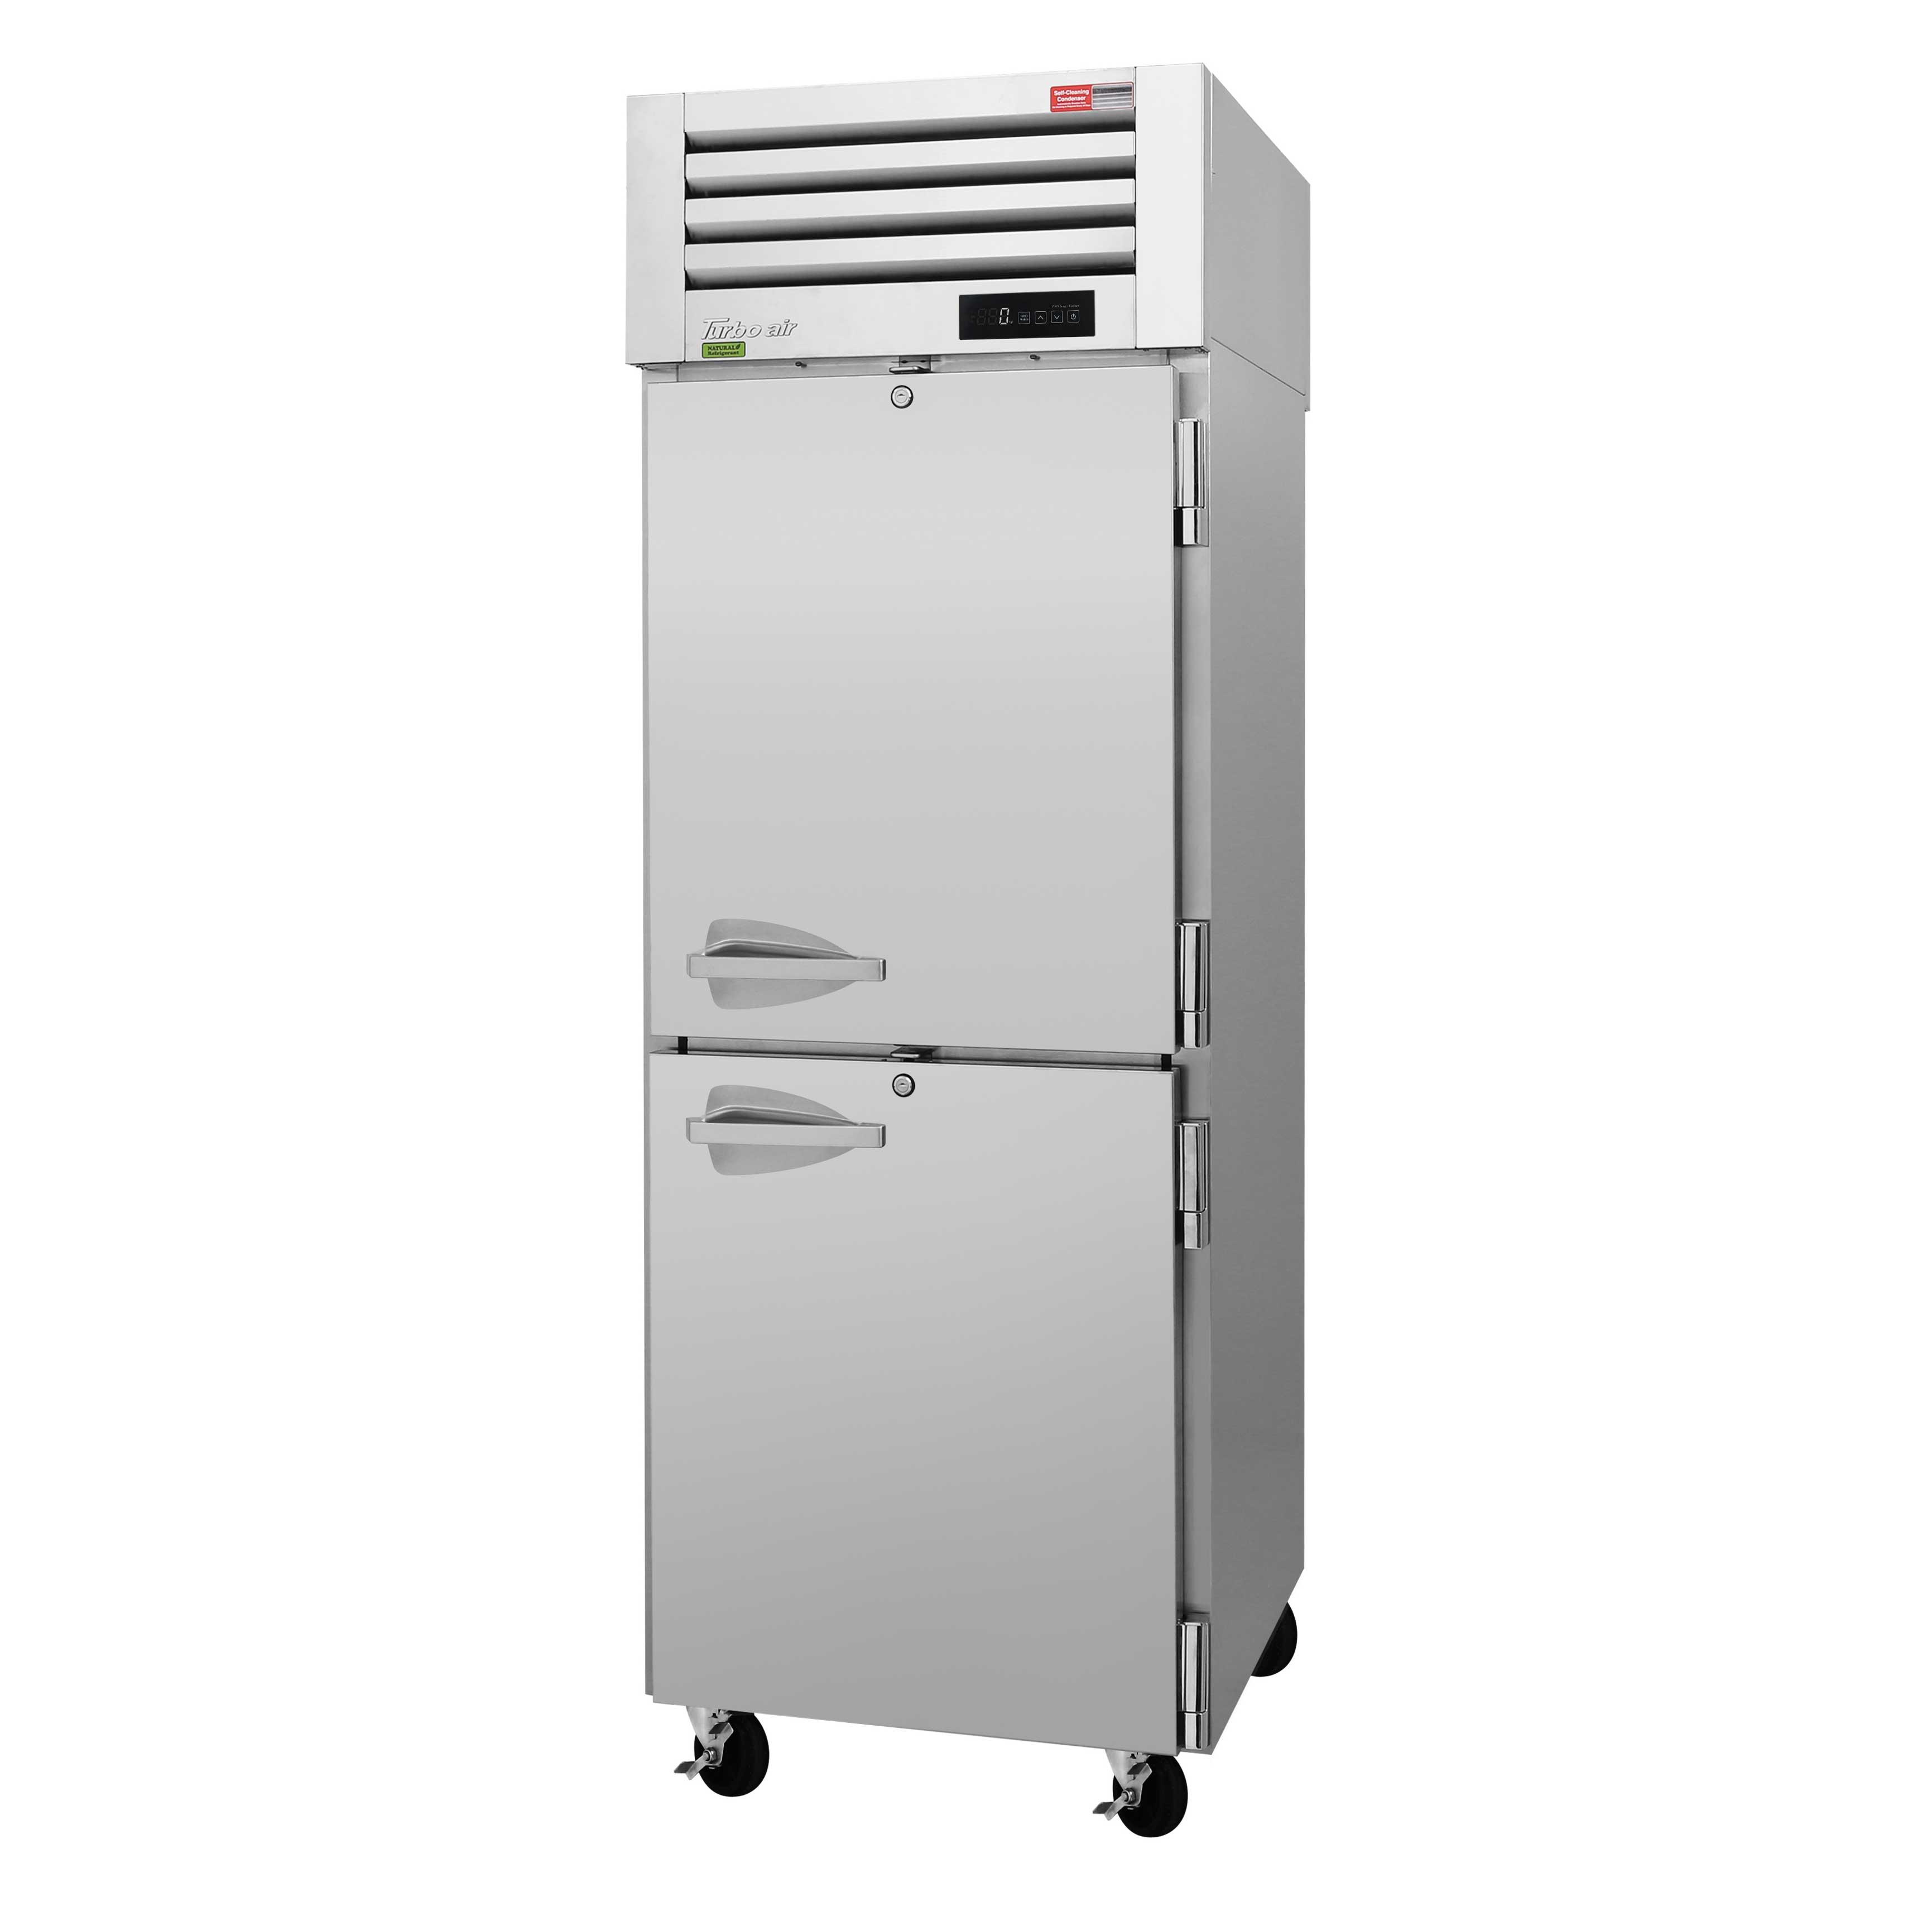 Turbo Air PRO-26-2F-N freezer, reach-in